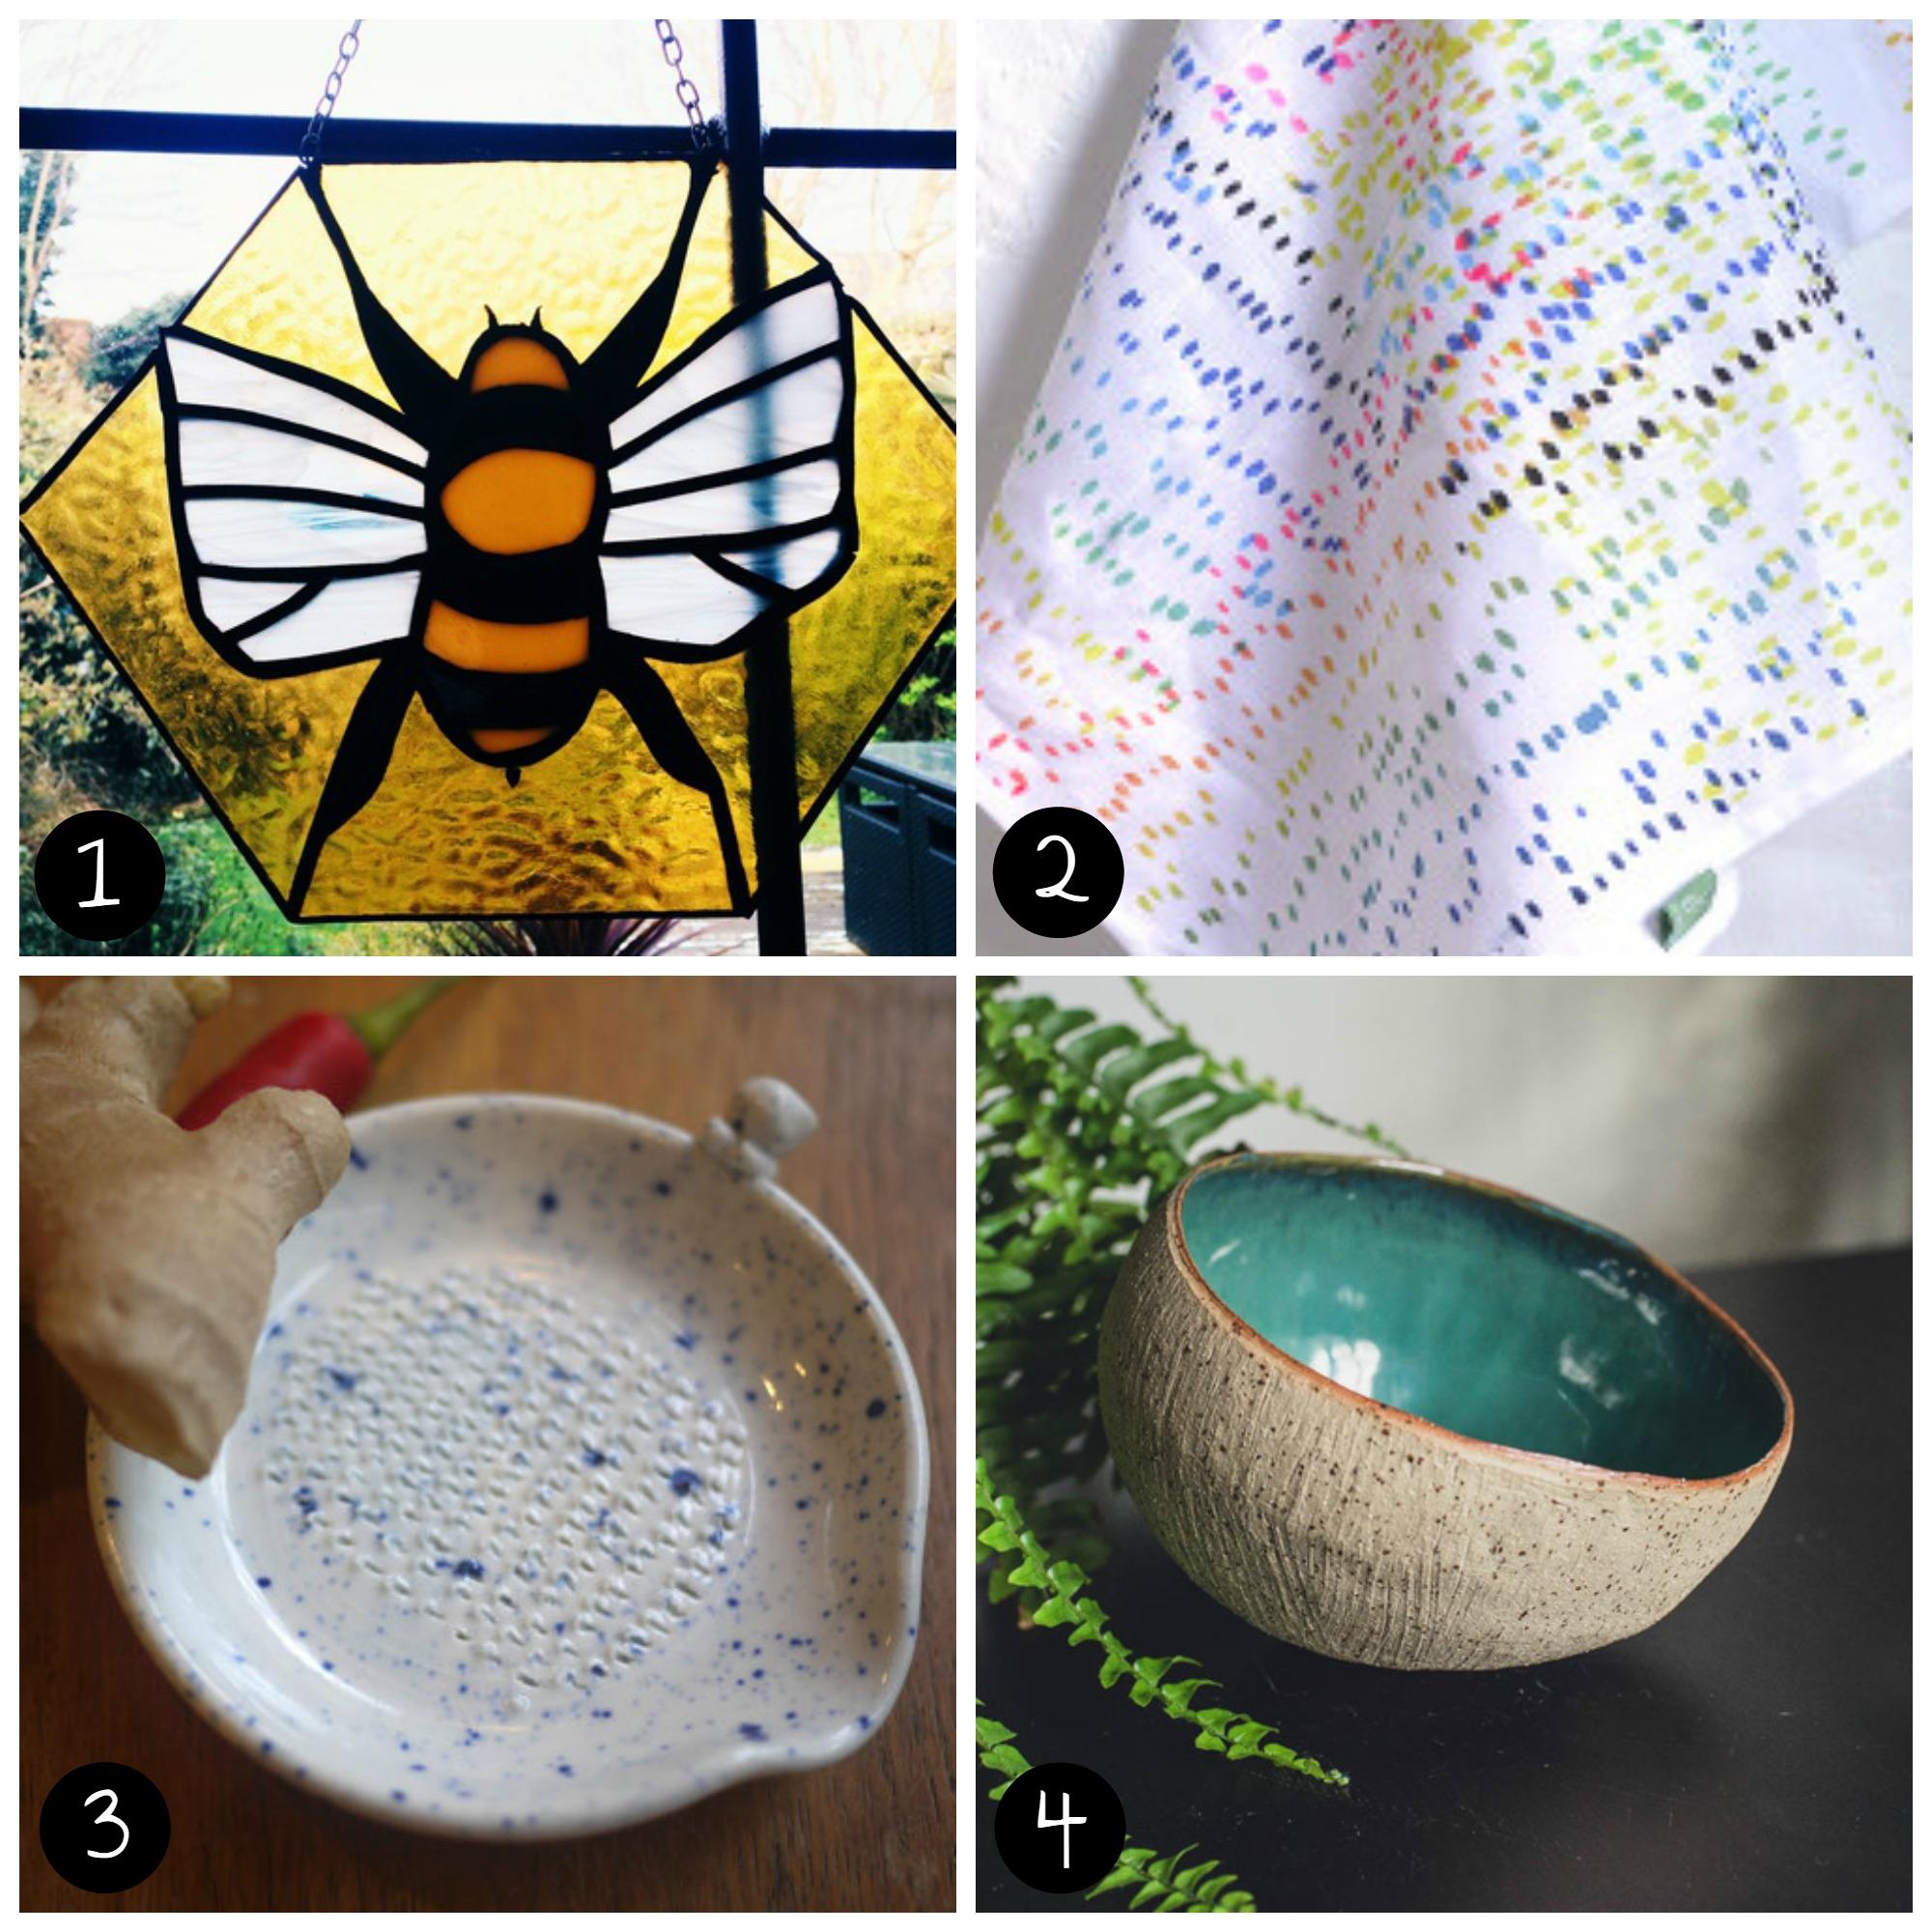 1.  Ittindi Glass  (Peckham - Sat 11 April), 2.  JoannaZenghelis (Peckham - Sun 12 April), 3. Nyanko Pots  ( Peckham - Sun 12 April), 4.  Daisy Cooper Ceramics  (Peckham - Sat 11 April)